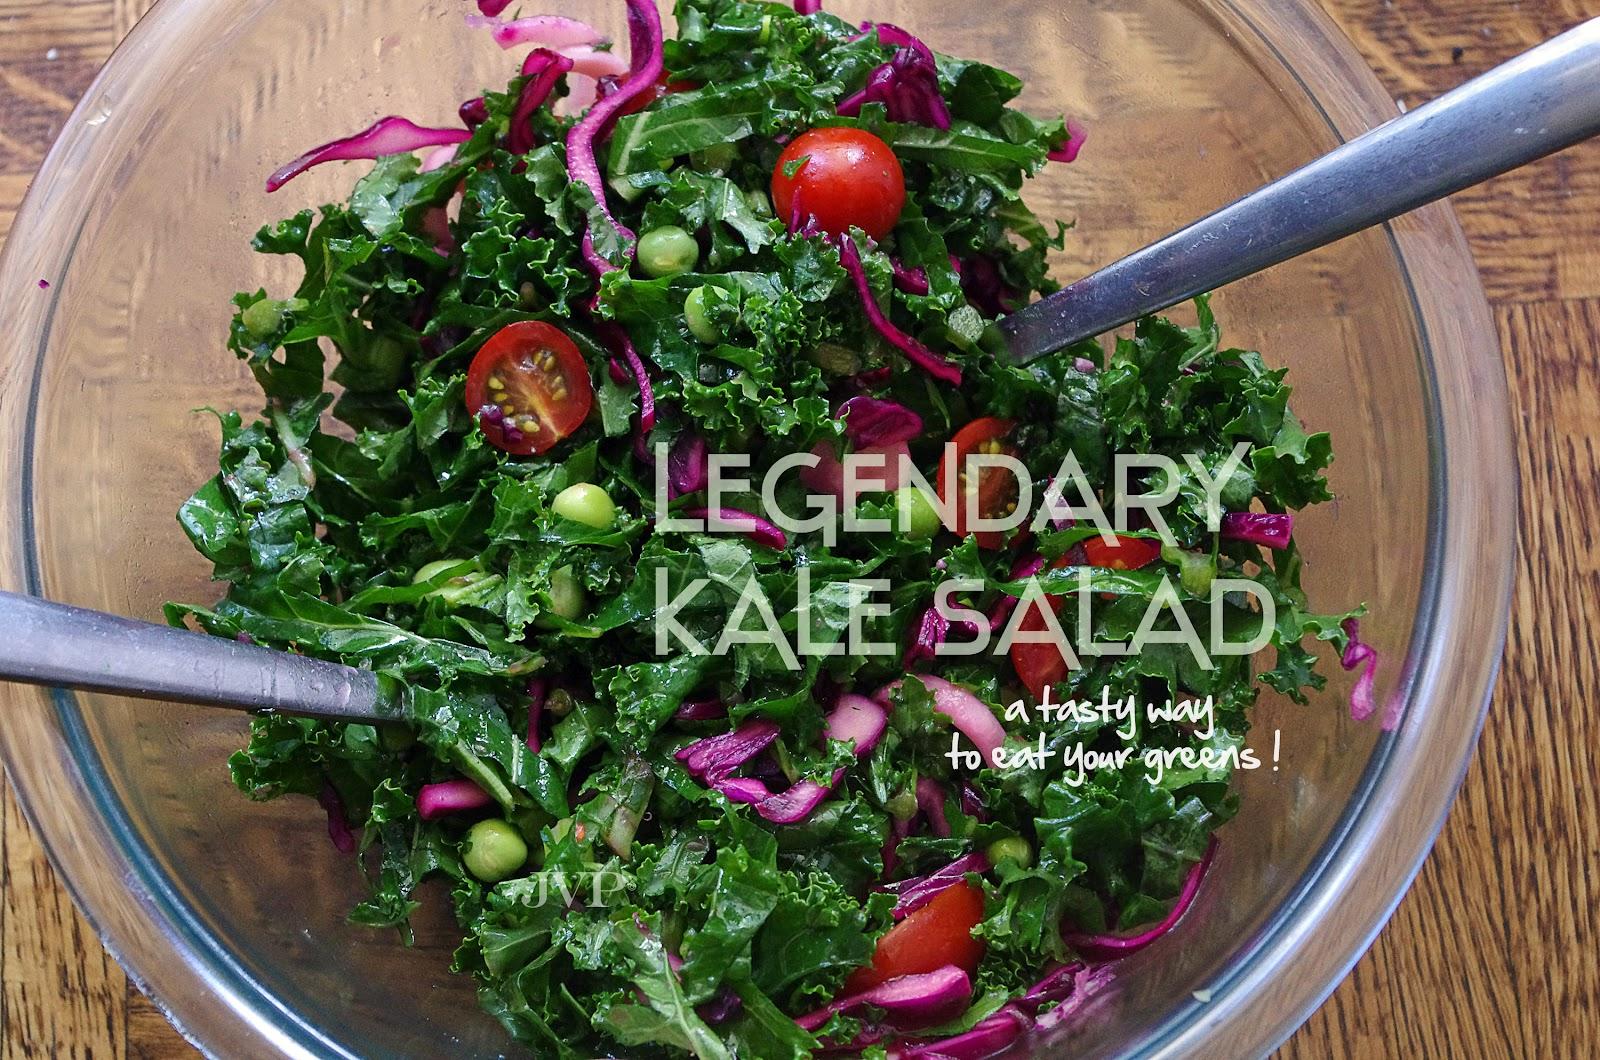 The Tomato Snob: My legendary Kale salad